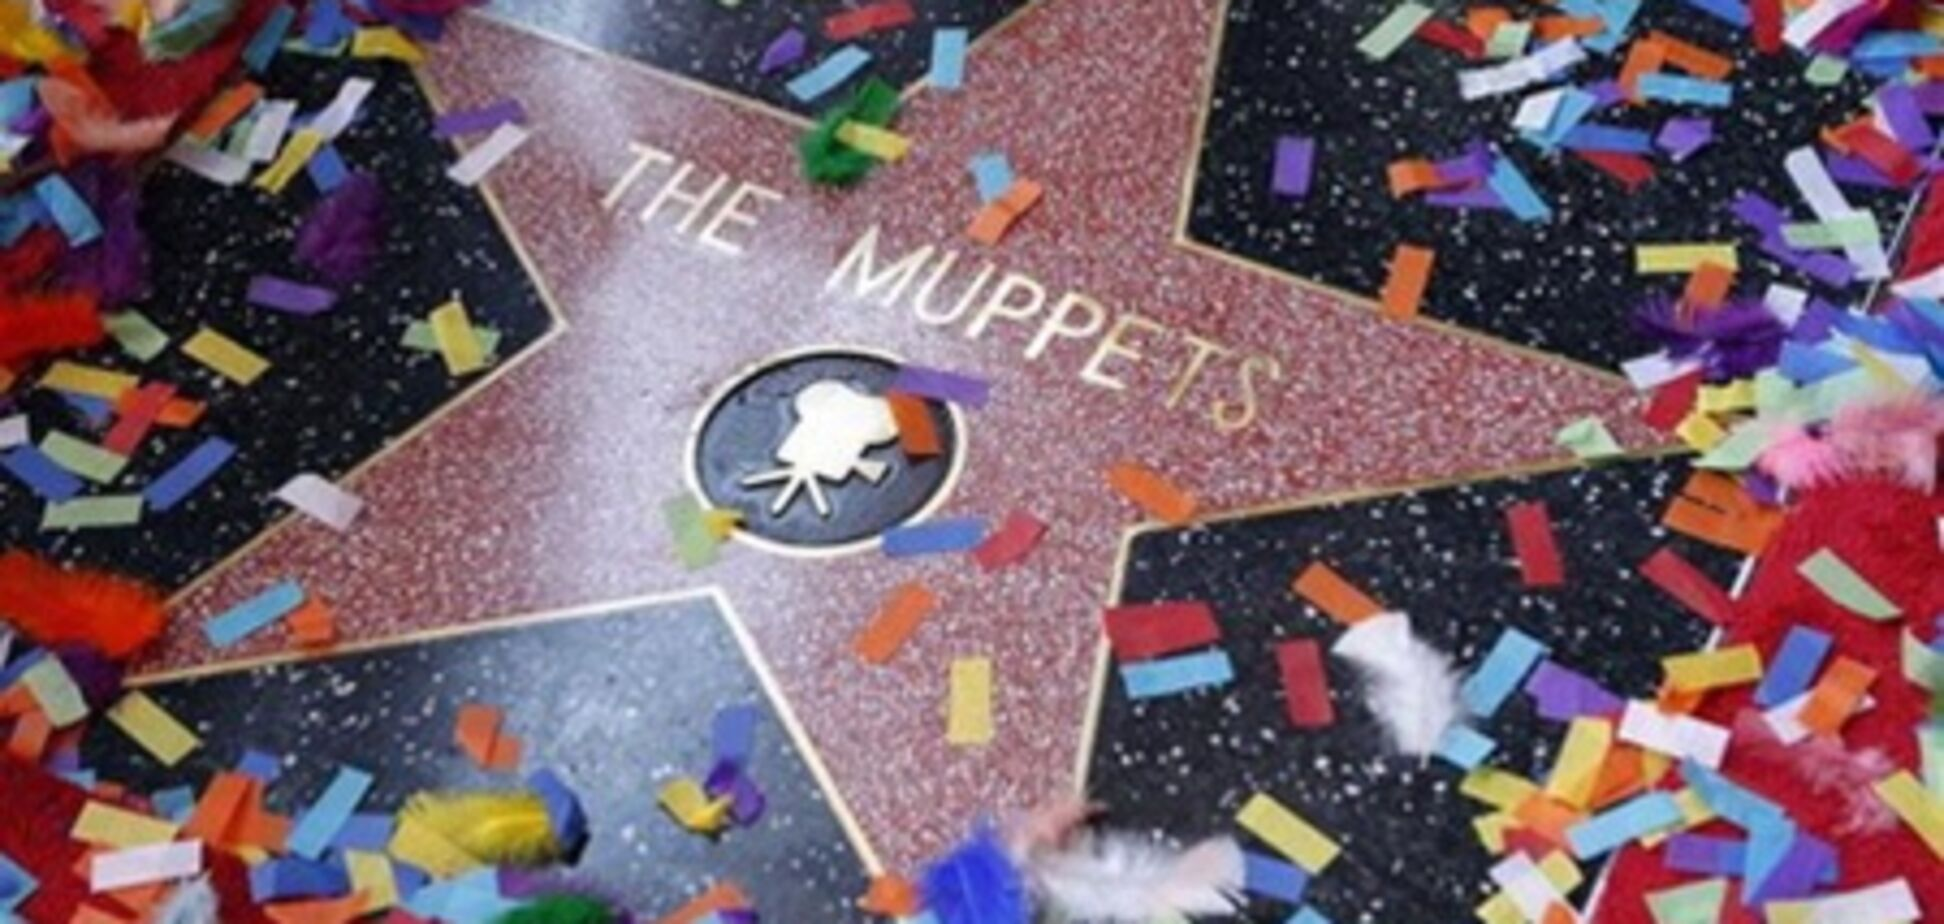 Маппеты получили звезду